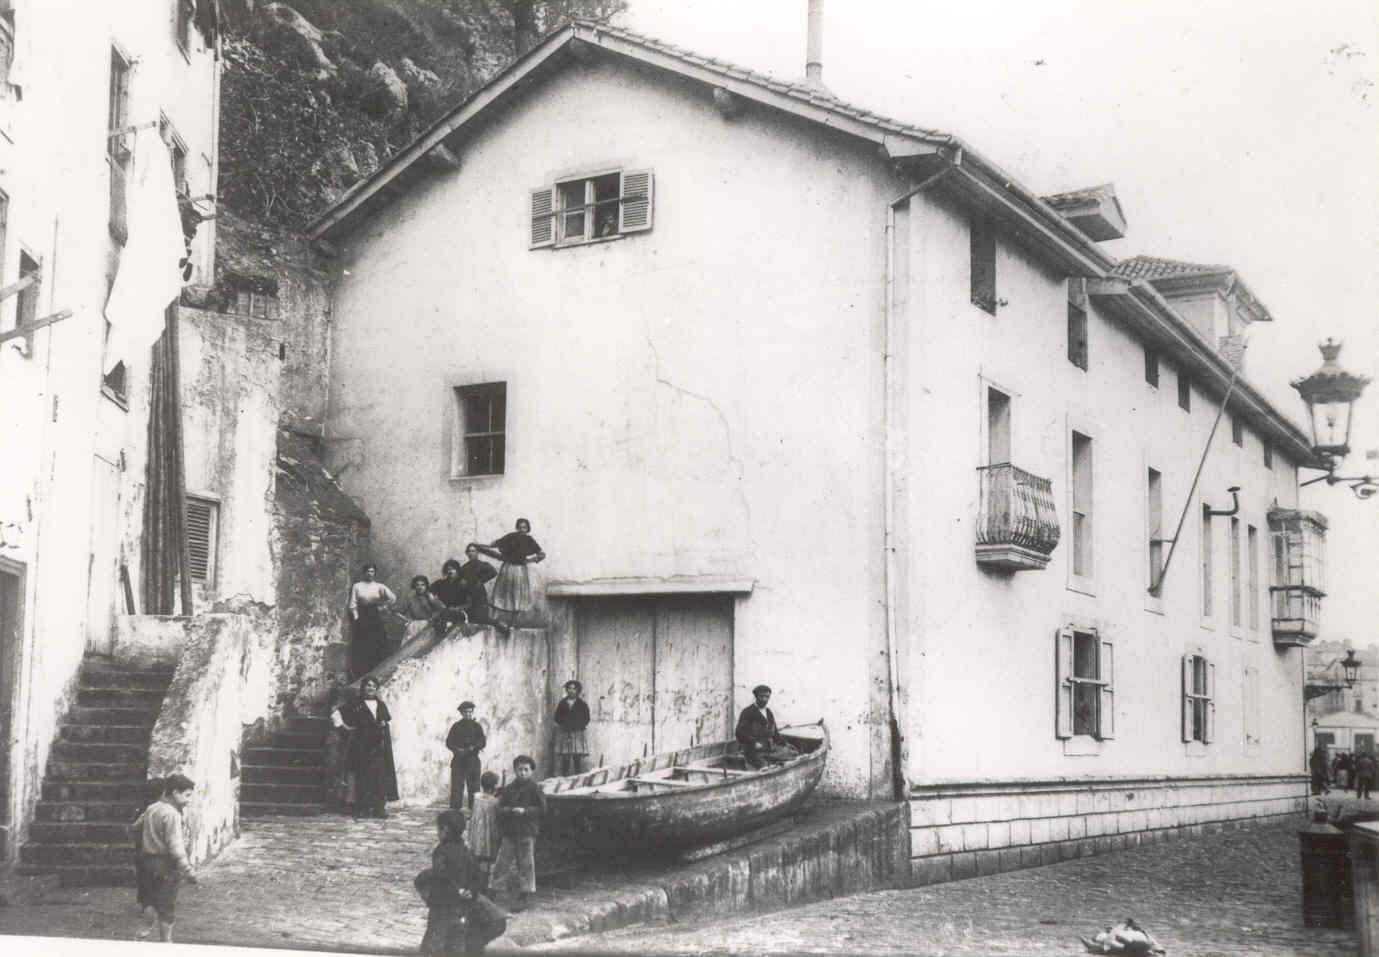 fotografia historica museo naval san sebastian_via galeria fotografica web museo